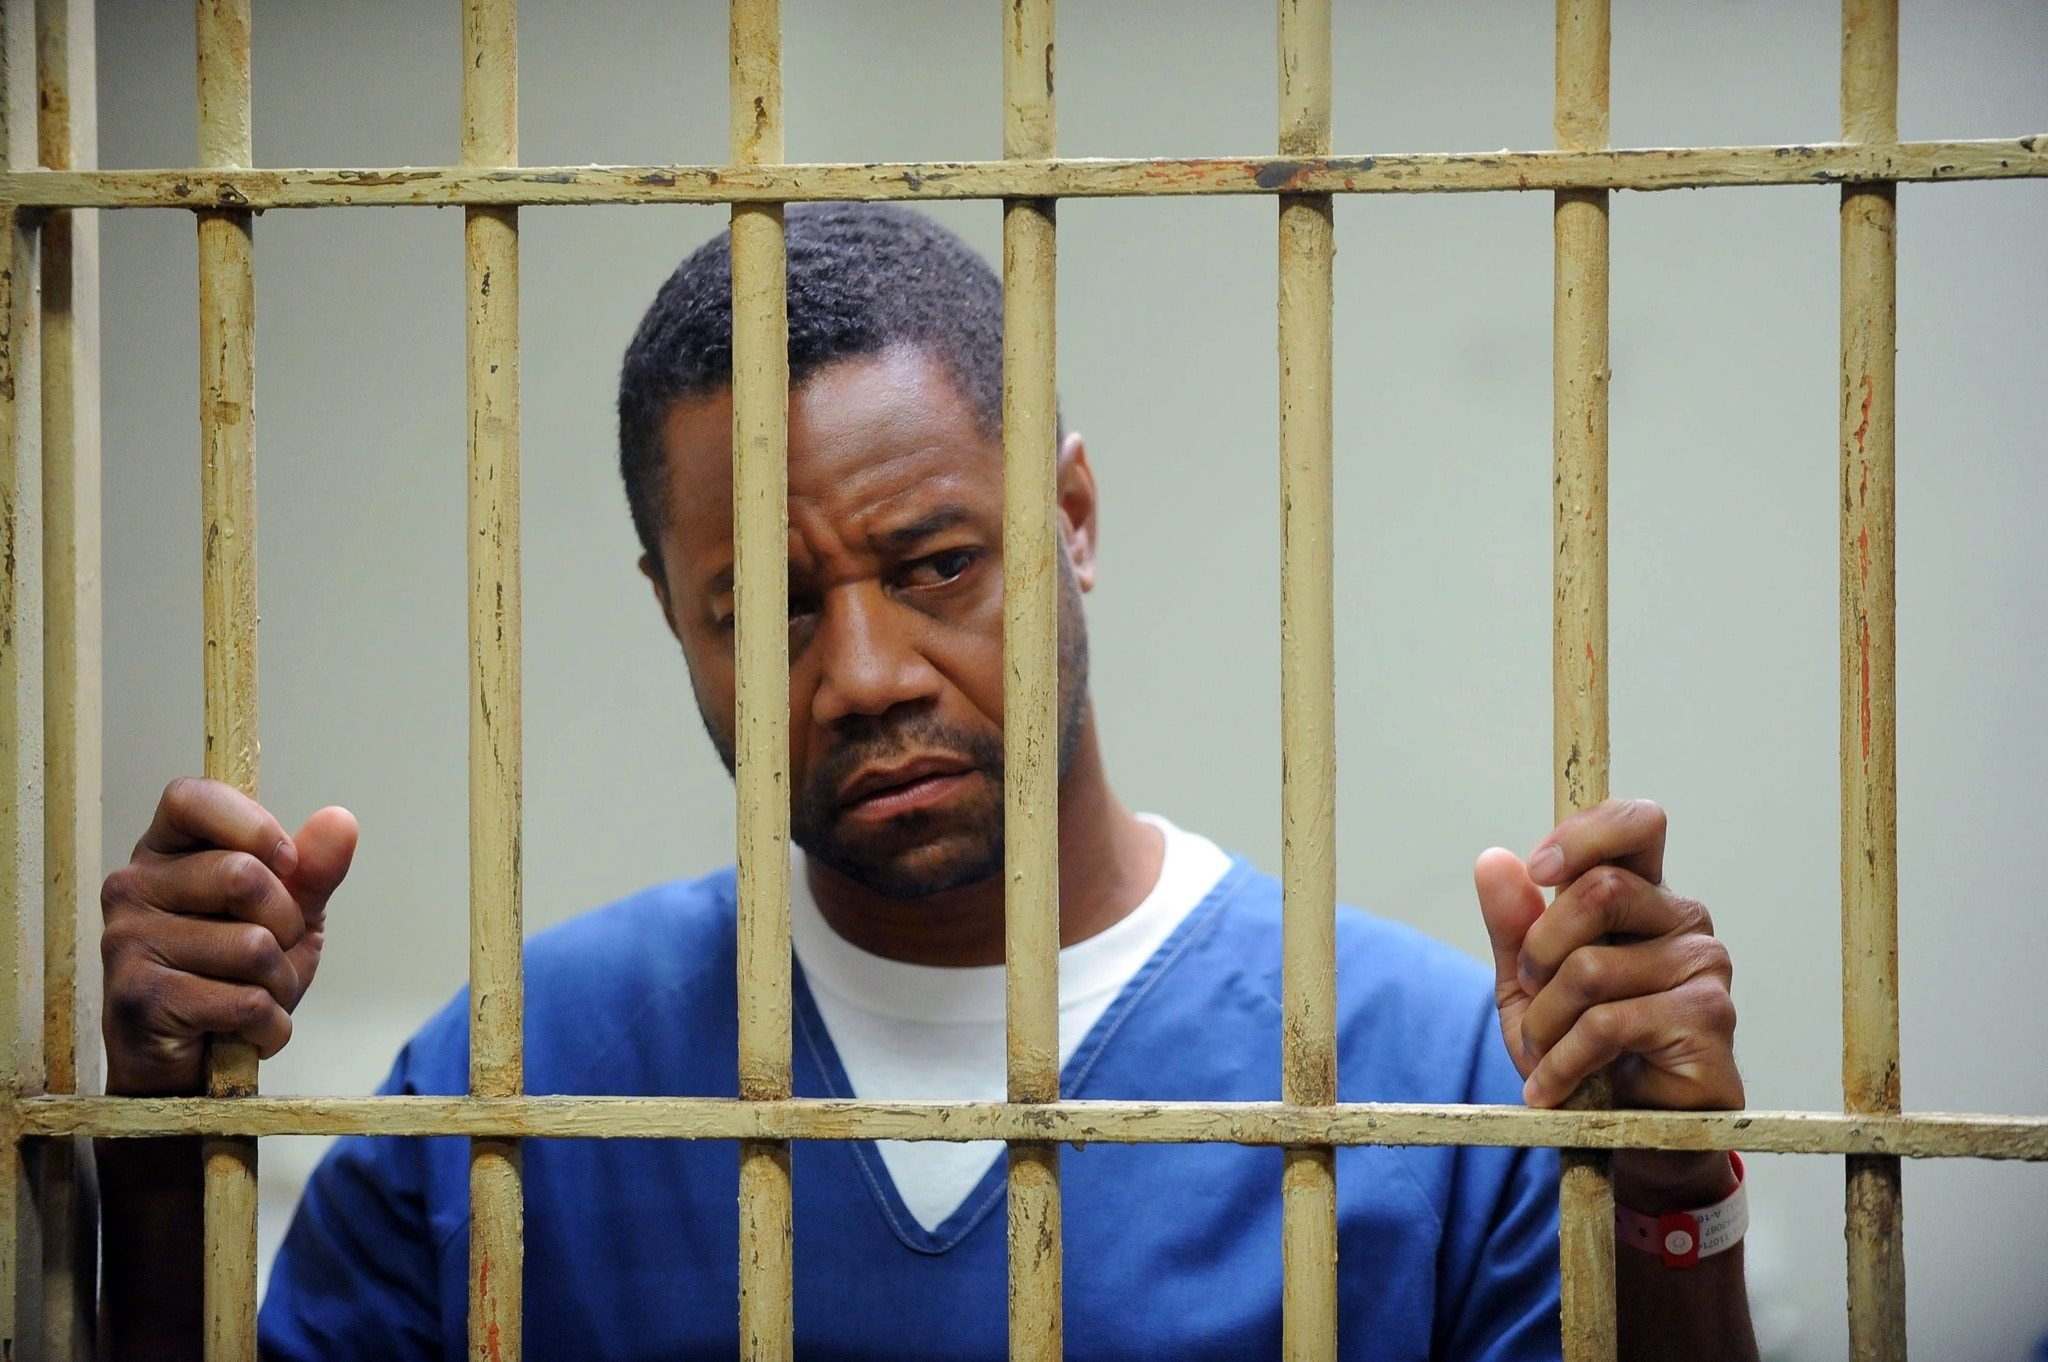 the-people-v-oj-simpson-american-crime-story-image-episode-3-cuba-gooding-jr-as-o-j-simpson